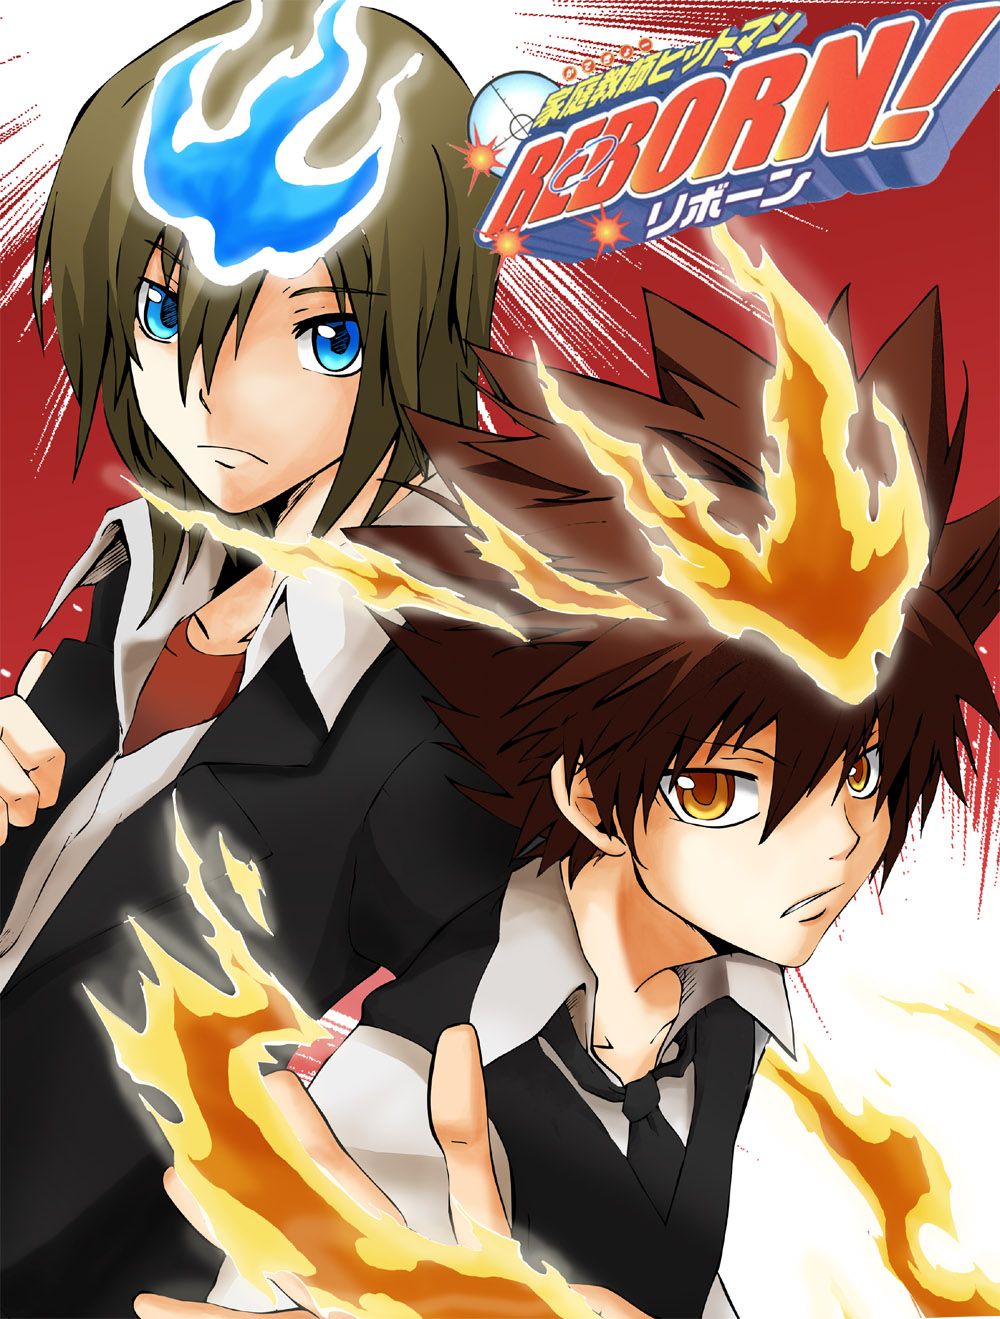 http://fc04.deviantart.net/fs24/f/2007/313/9/7/FA6__Katekyo_Hitman_Reborn_by_mazjojo.jpg